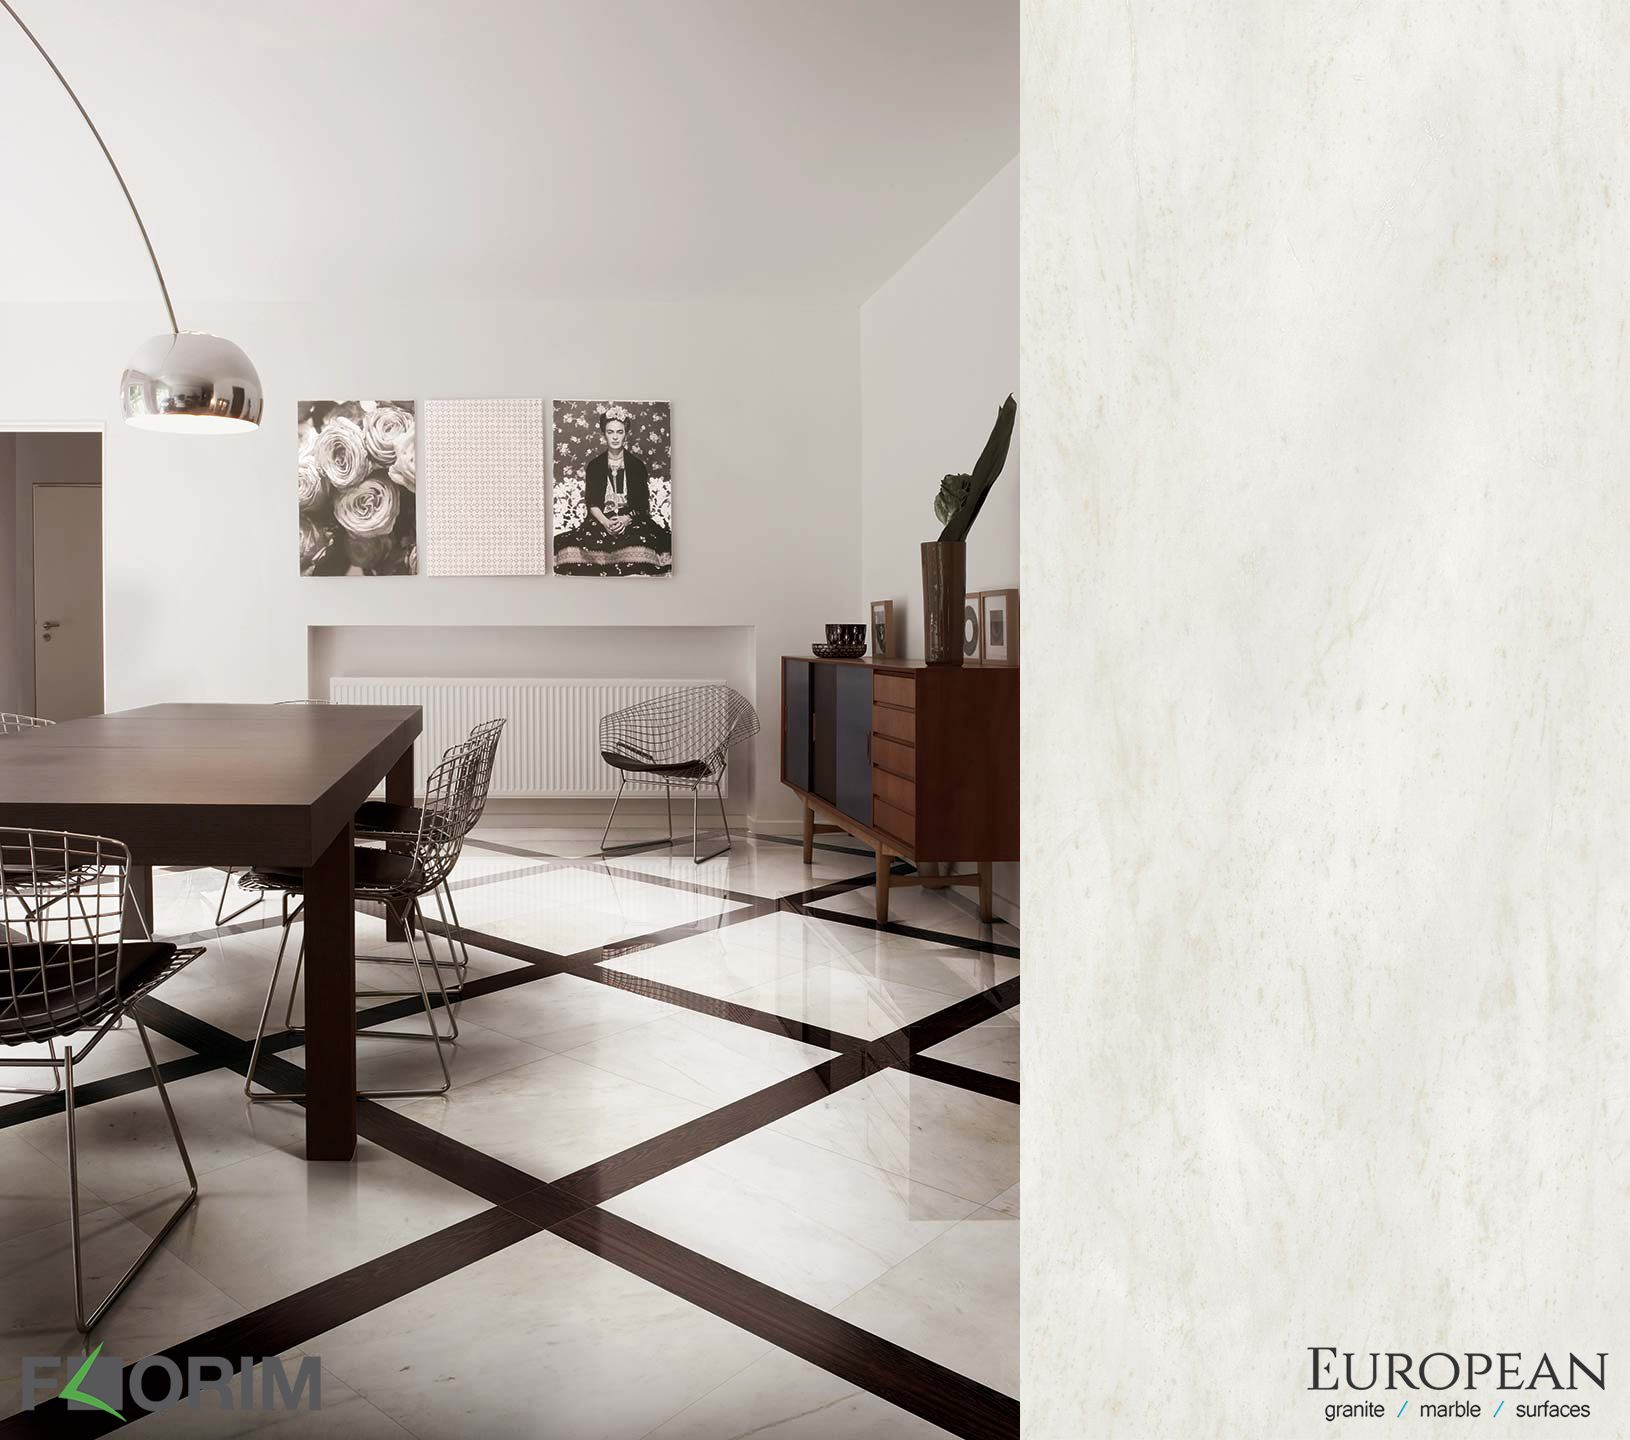 Look No Further Than Florim  Our Luxury Porcelain Tile